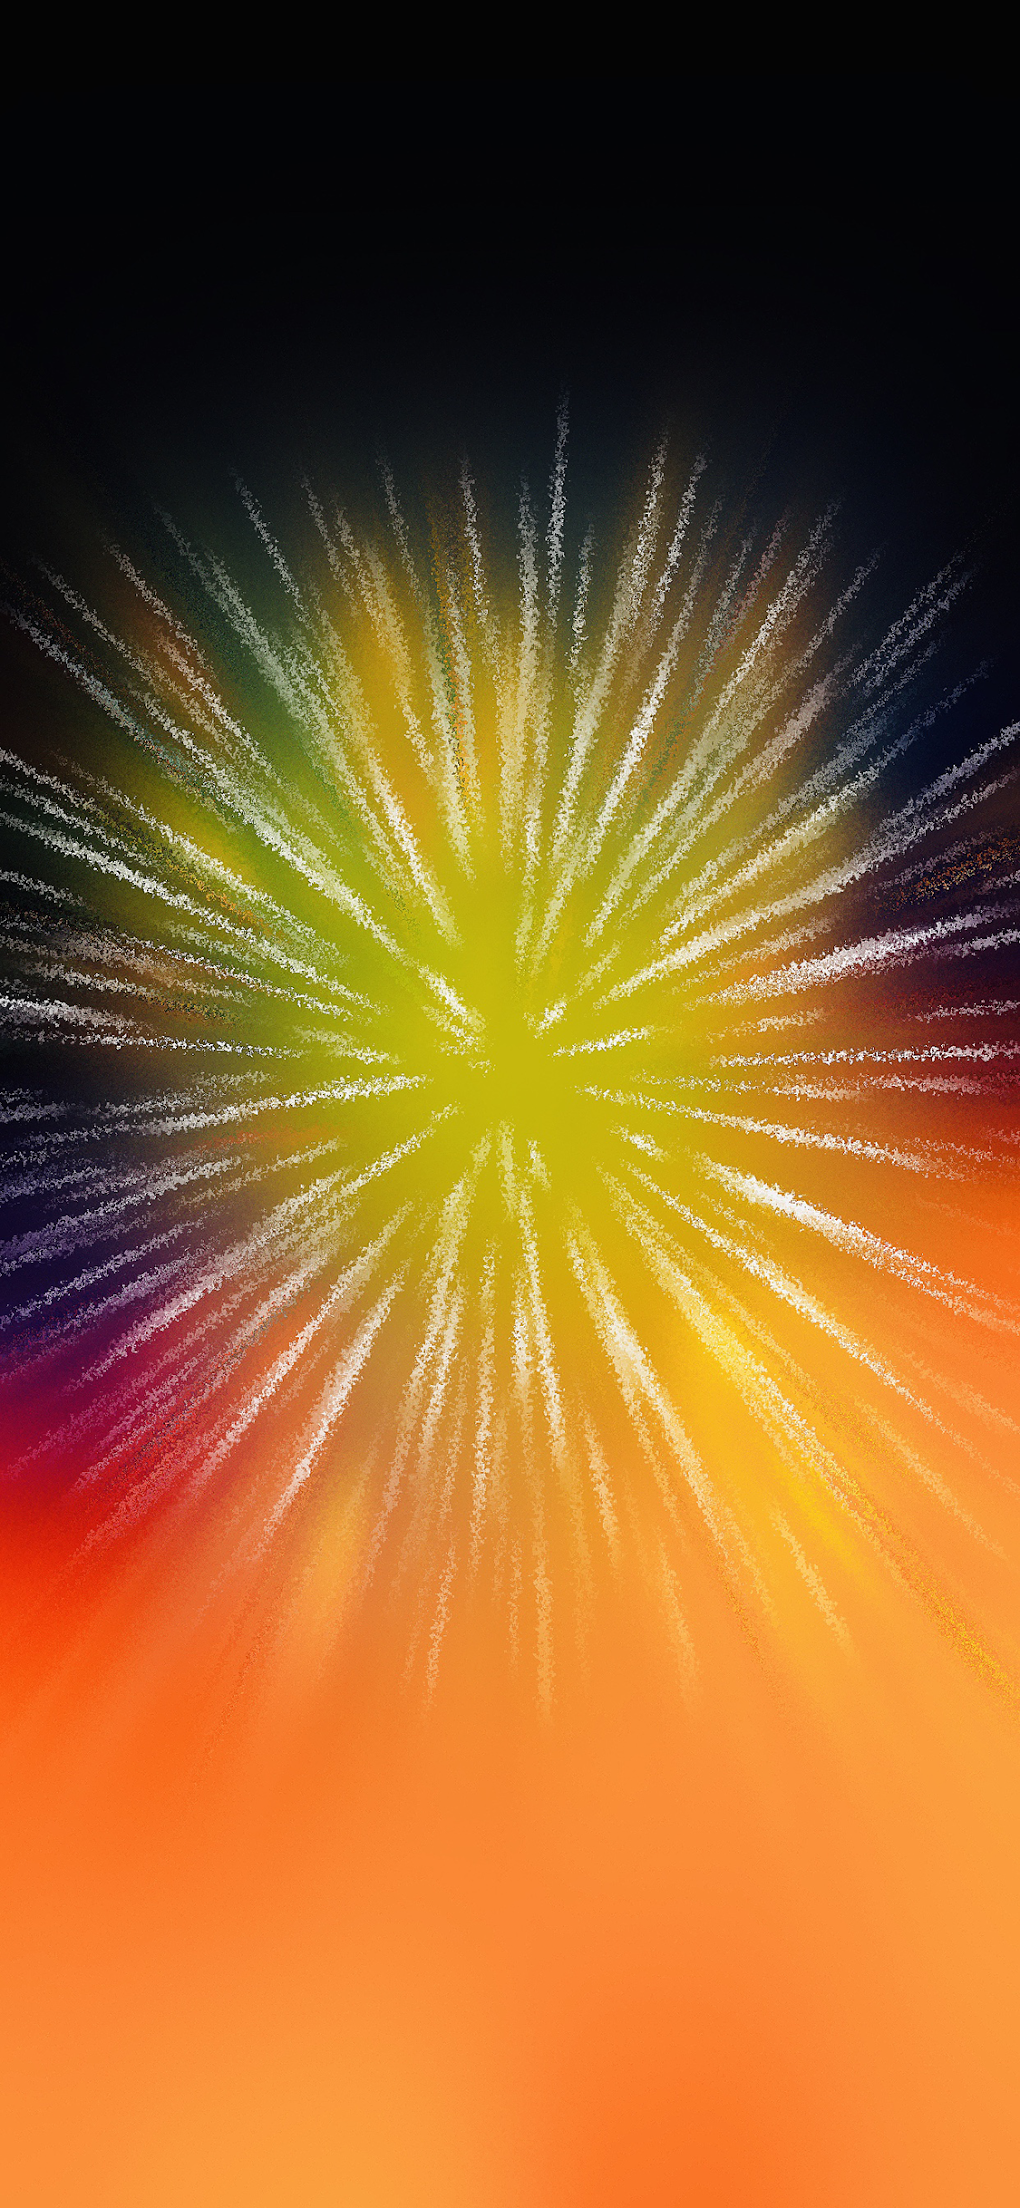 Idea by Daniel Ivan on iPhone Wallpaper, Star wallpaper